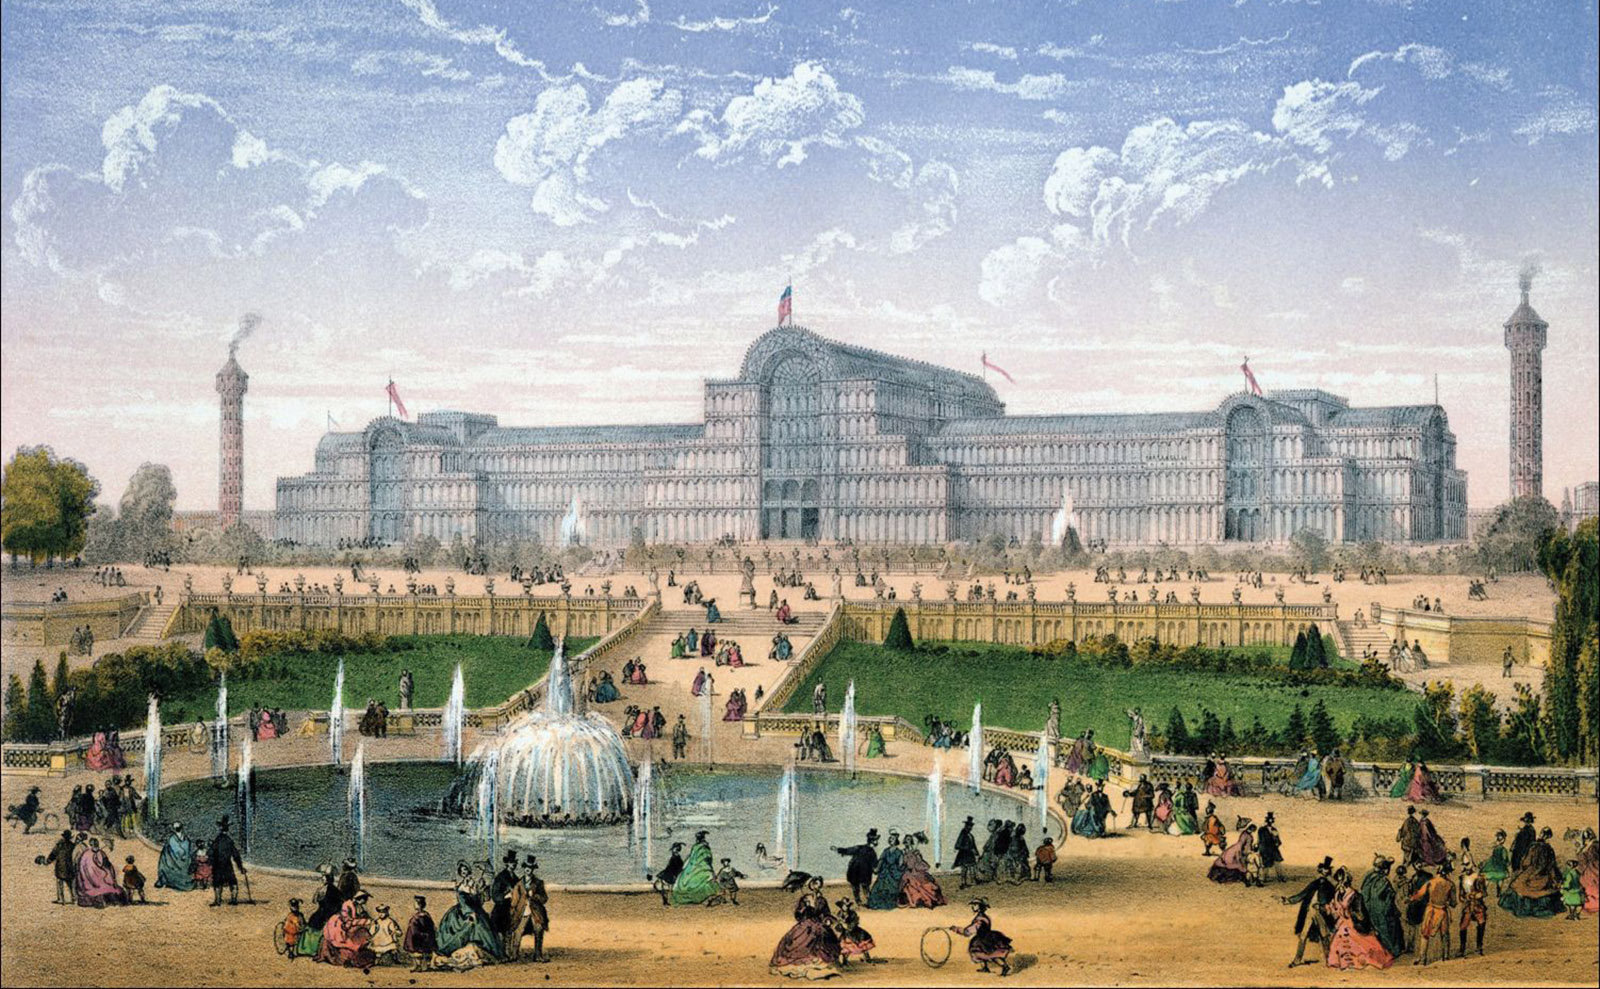 vintage postcard images of crystal palace